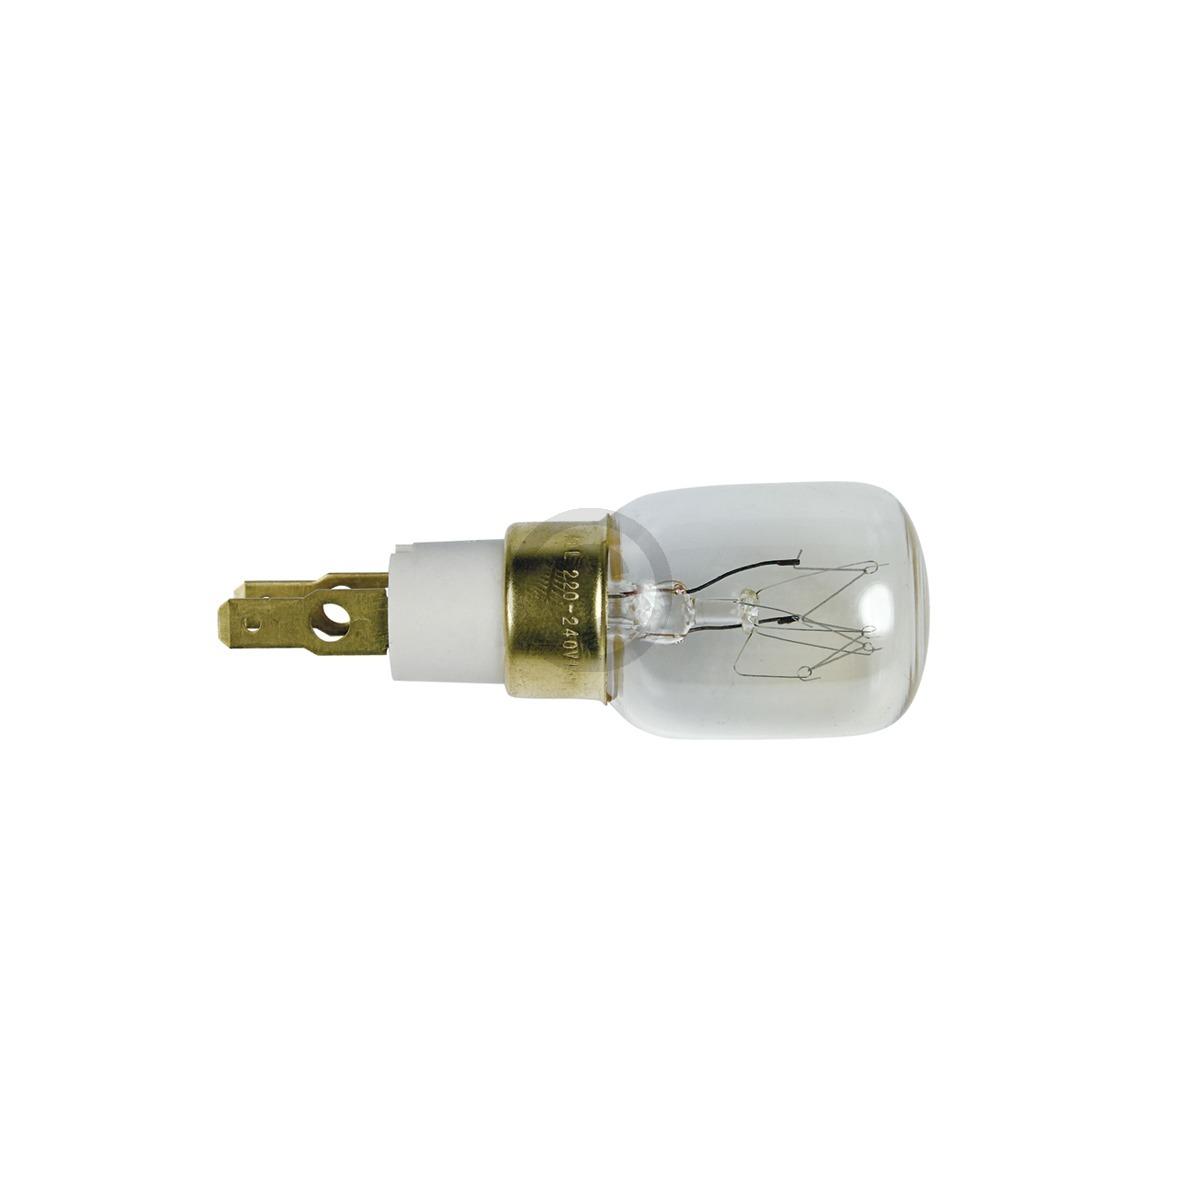 Lampe 15W 220-240V TClick T25 484000000979